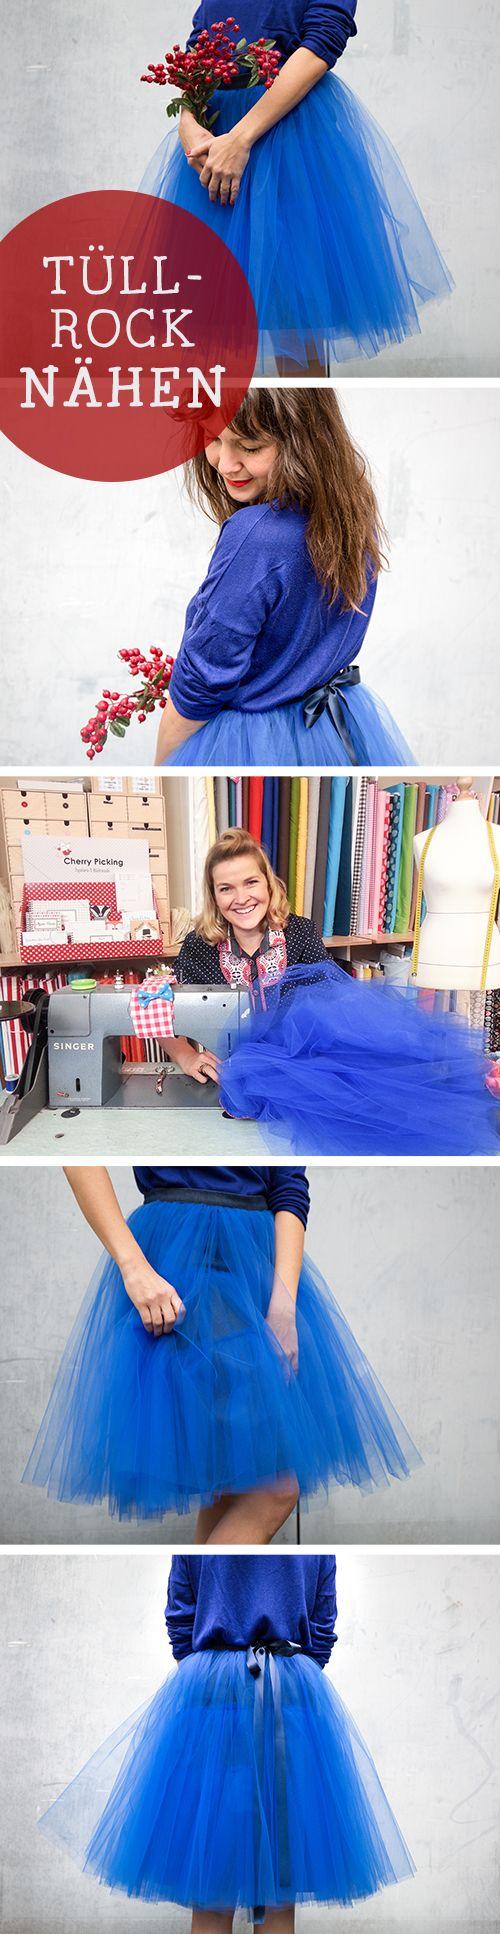 VIDEO: Traumhafte DIY-Anleitung für einen genähten Tüllrock / diy sewing tutorial: make your own tulle skirt, crafting via DaWanda.com